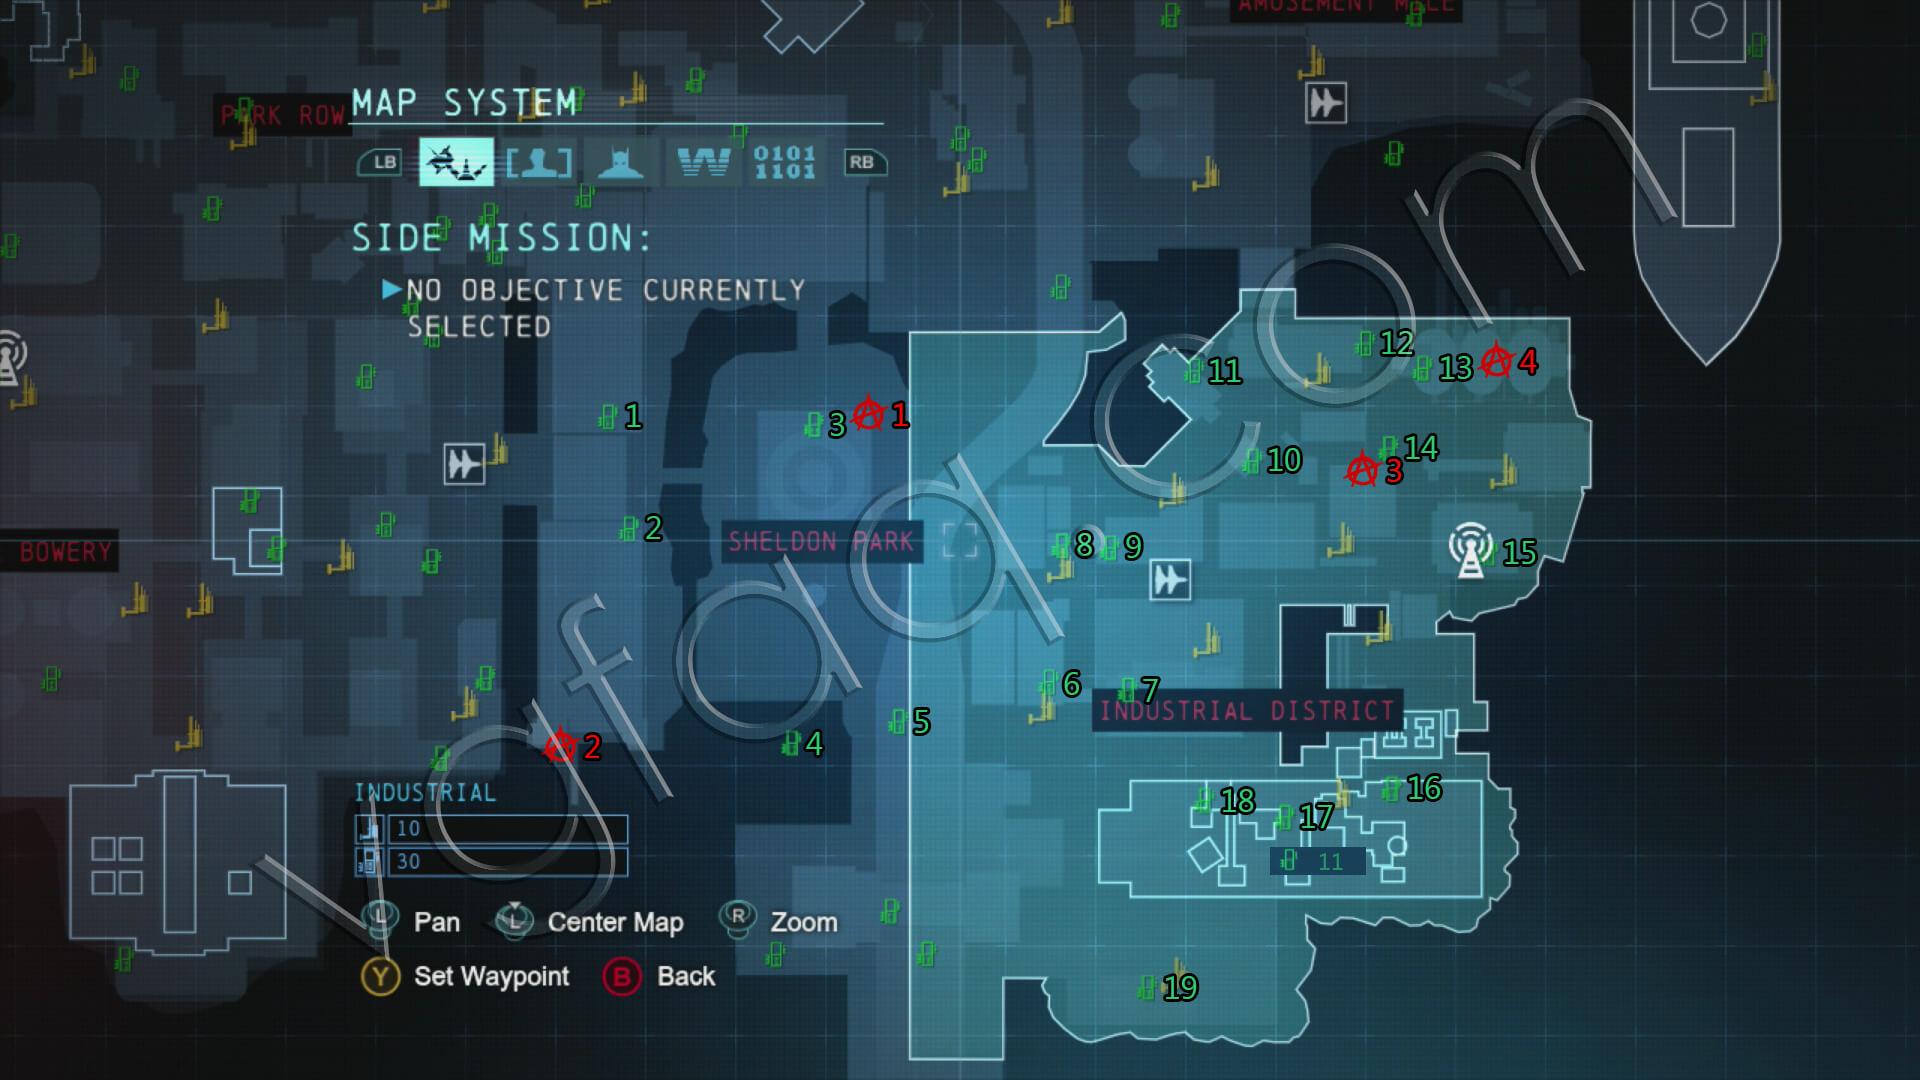 Batman: Arkham Origins Industrial District Collectibles Locations